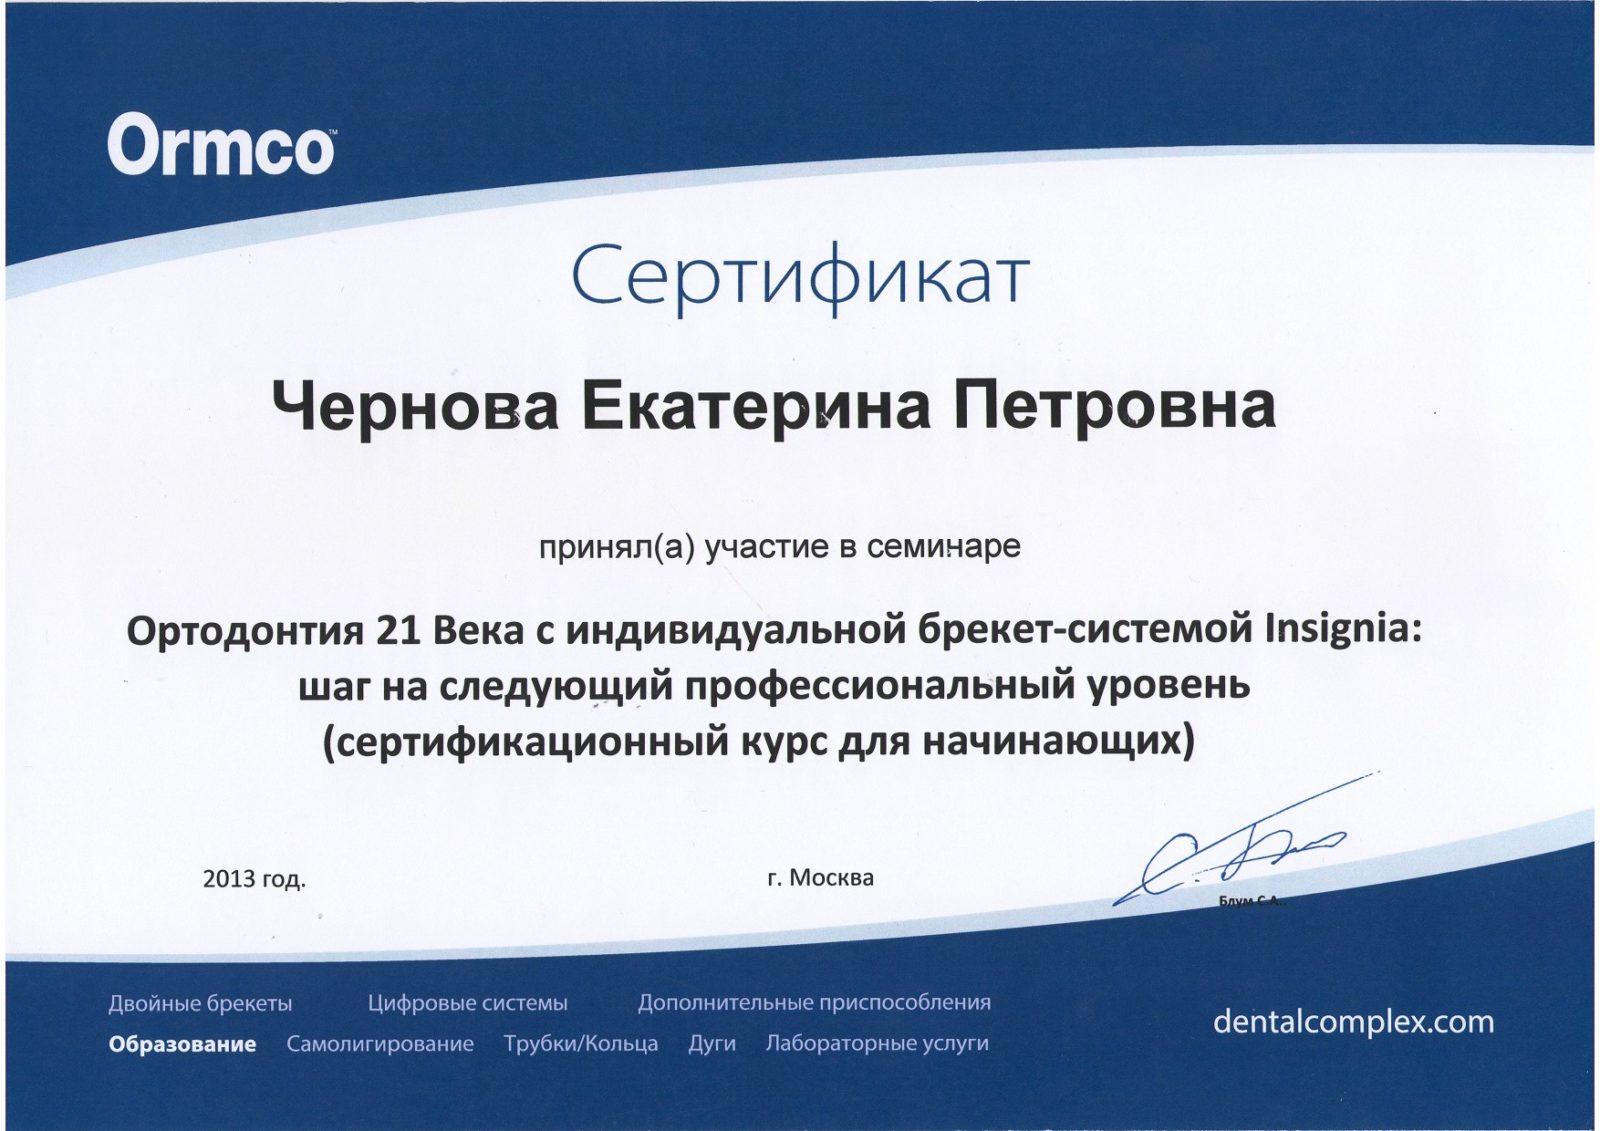 http://oris-vidnoe.ru/wp-content/uploads/2021/06/chernova-6.jpg